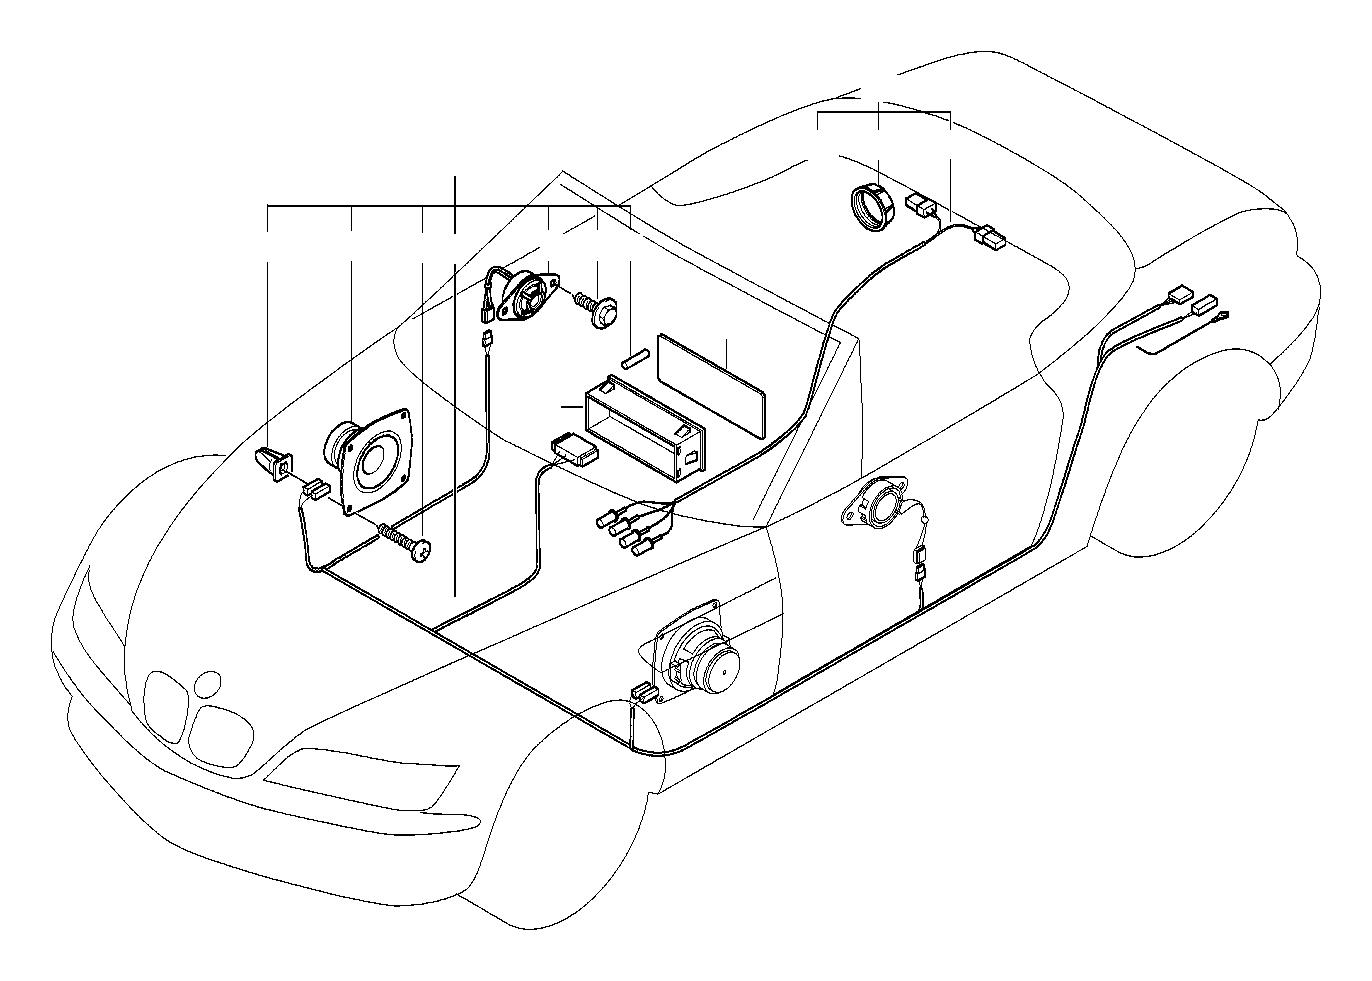 1999 Bmw Z3 Audio Wiring Harness Auto Electrical Diagram Stereo